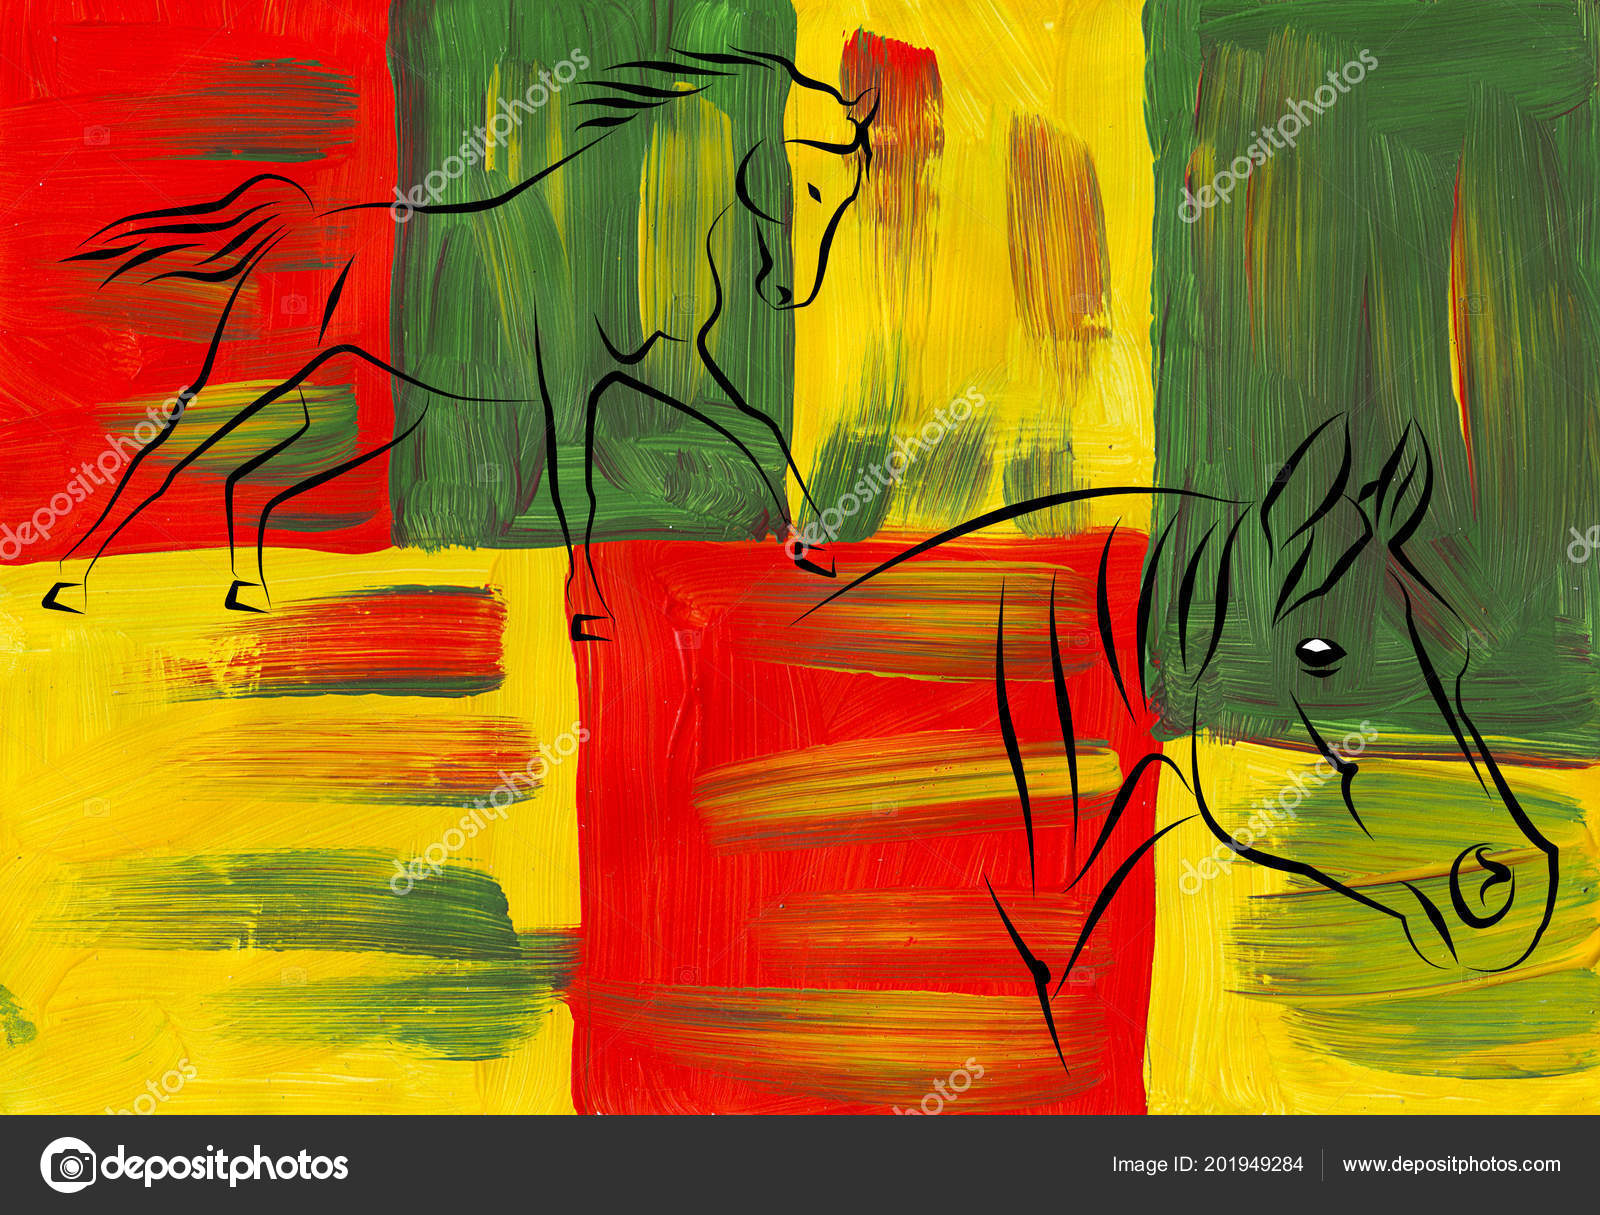 Horse Illustration Icon Art Design Stock Photo C Maxtor7777 201949284